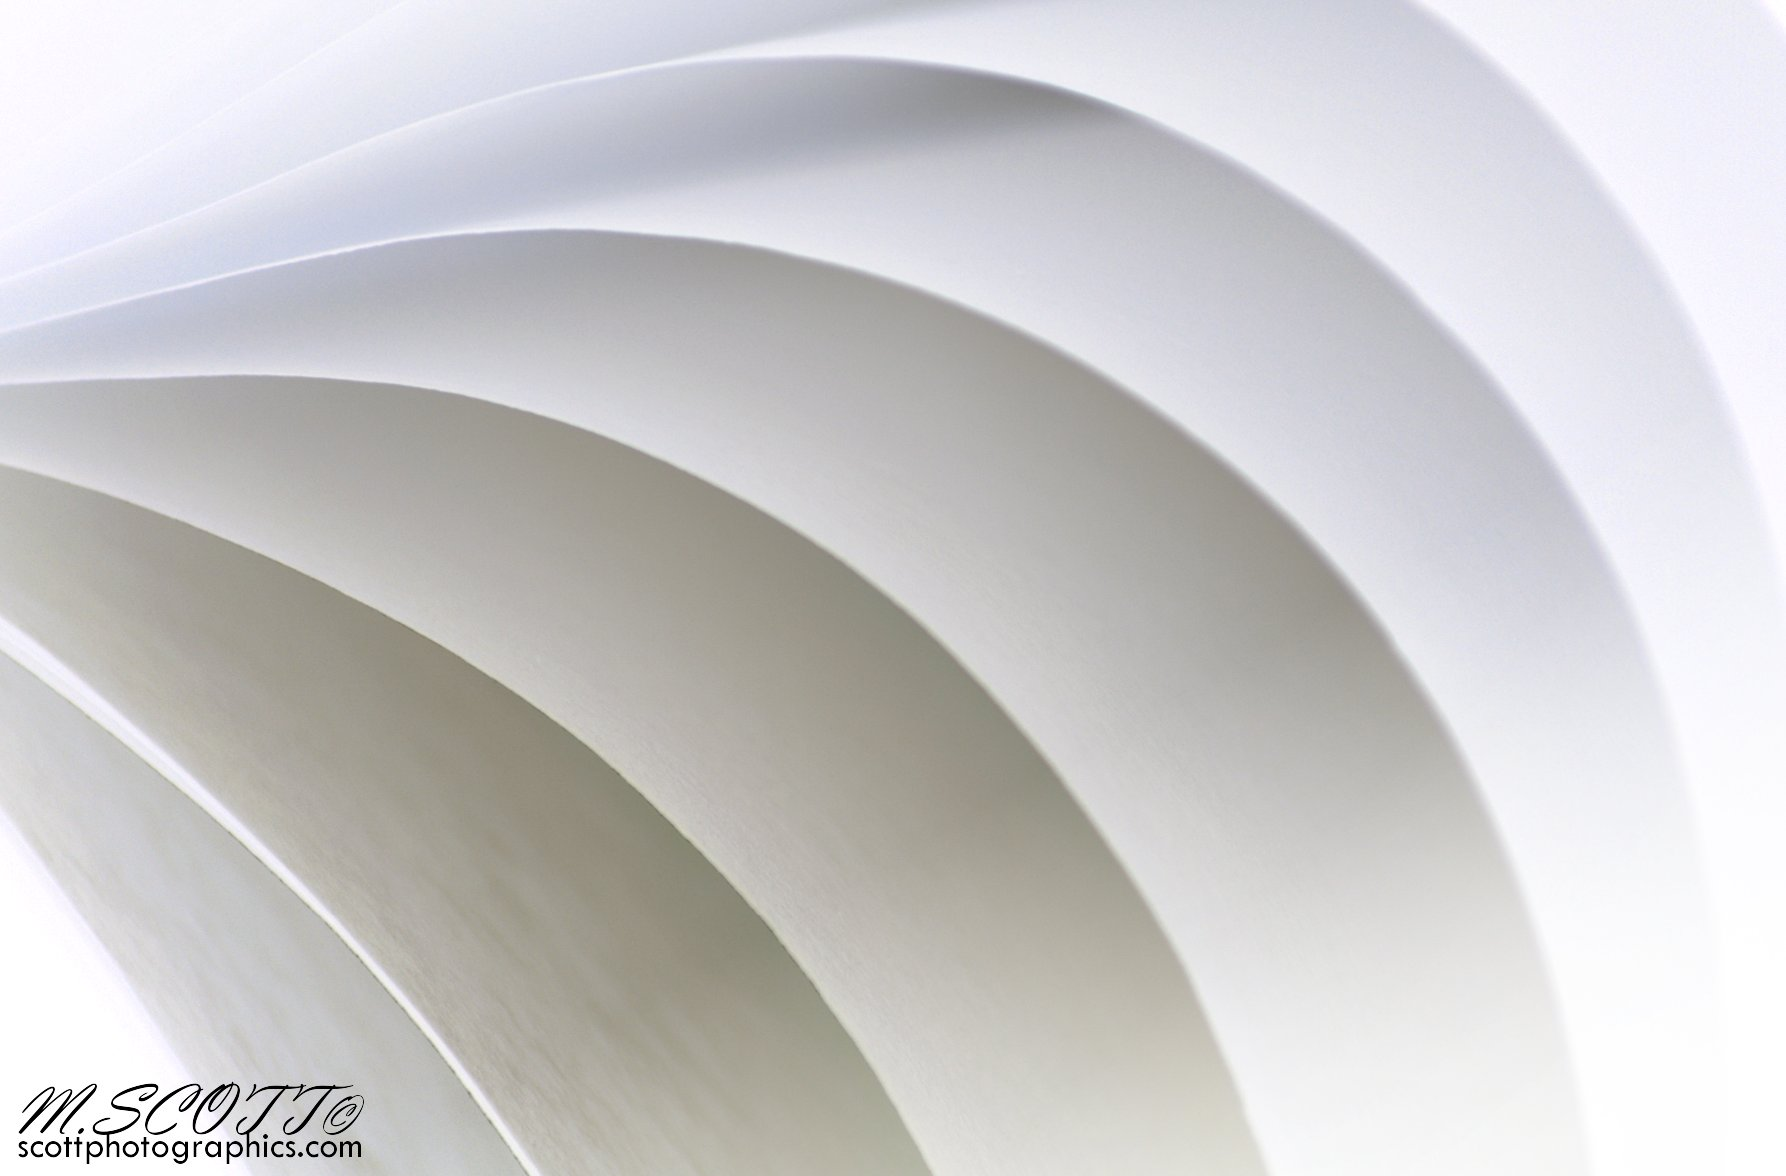 inverted-paper-sheets-coloured-1.jpg